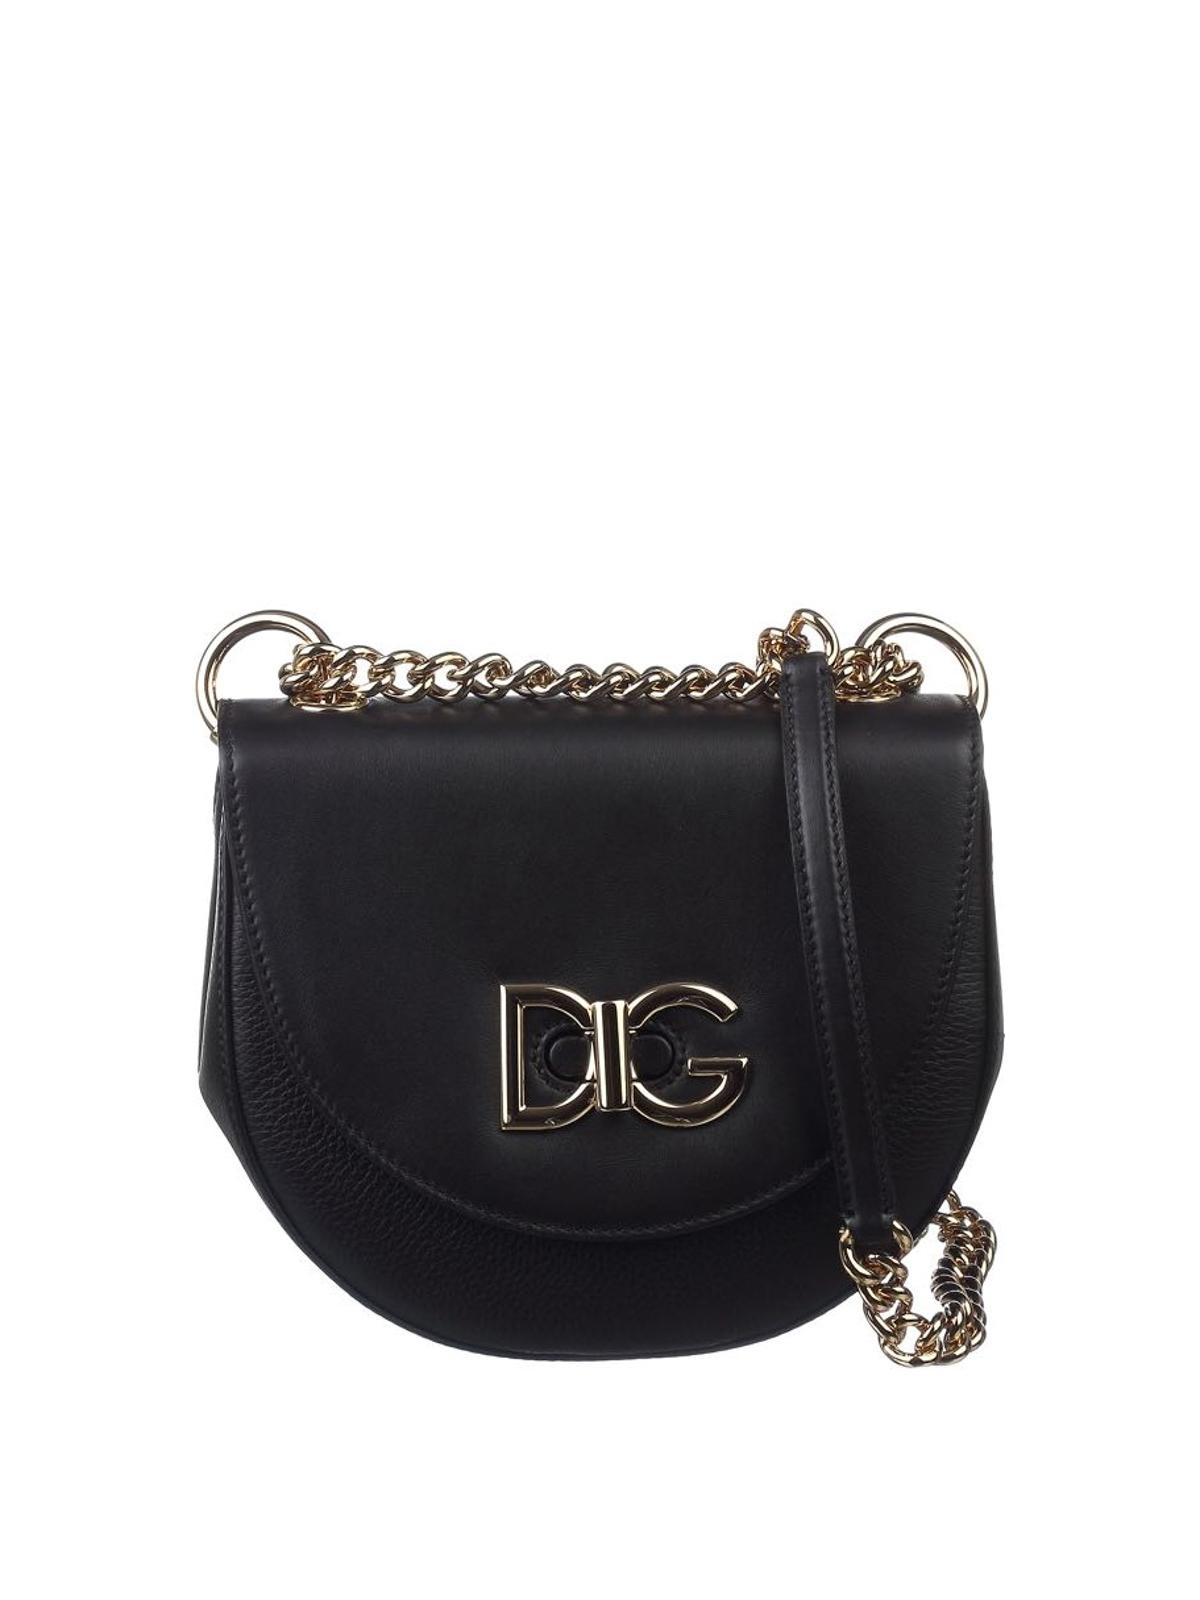 6e6be0765c5c Dolce   Gabbana - Wifi leather small bag - cross body bags ...